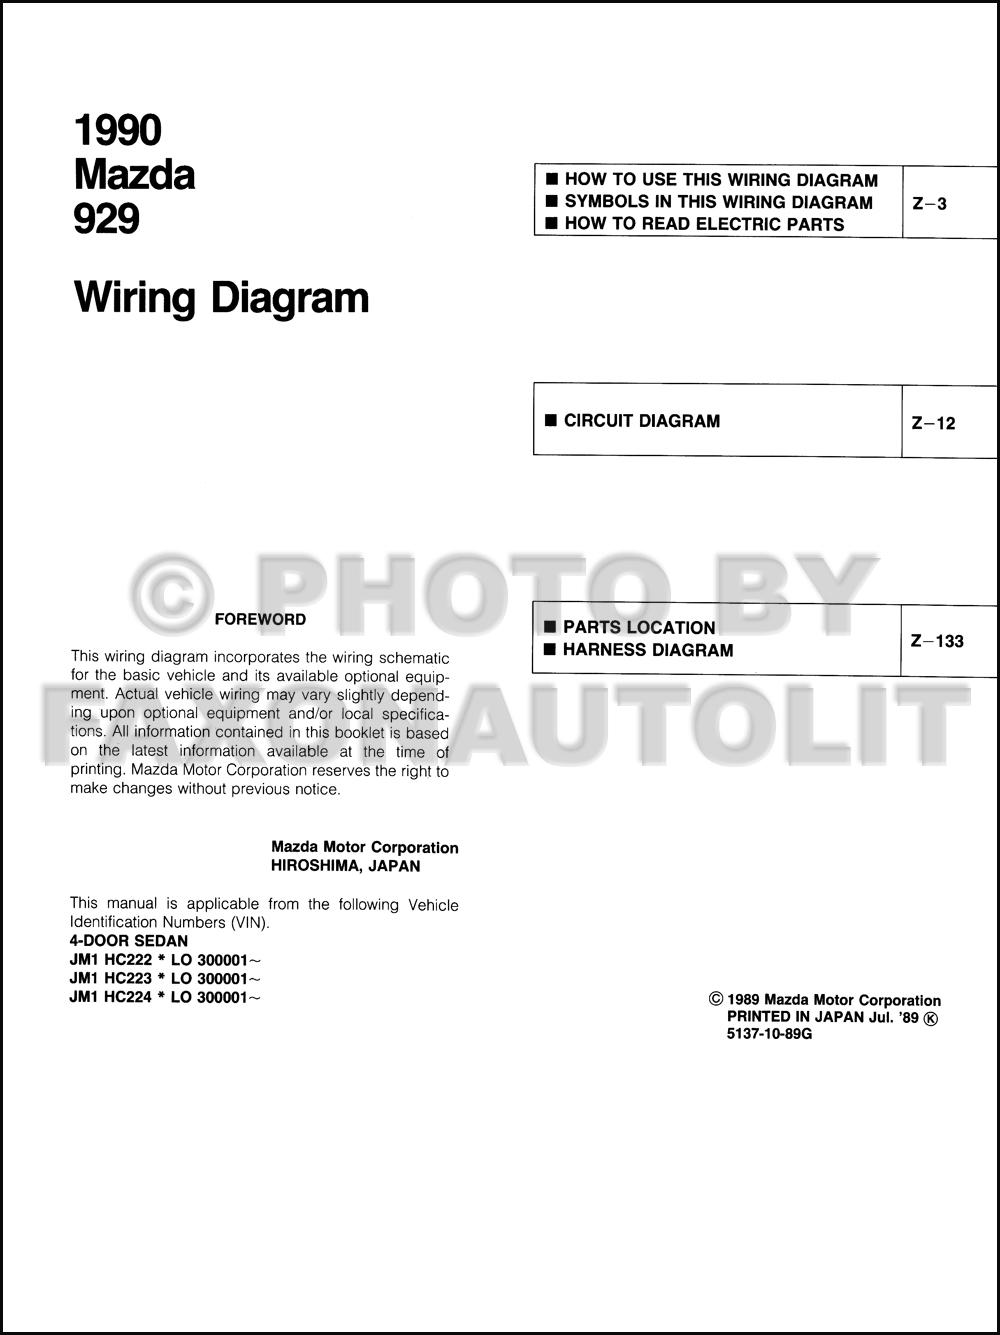 2004 mazda 6 wiring diagram free download mazda 929 wiring diagram 1990 mazda 929 wiring diagram manual original